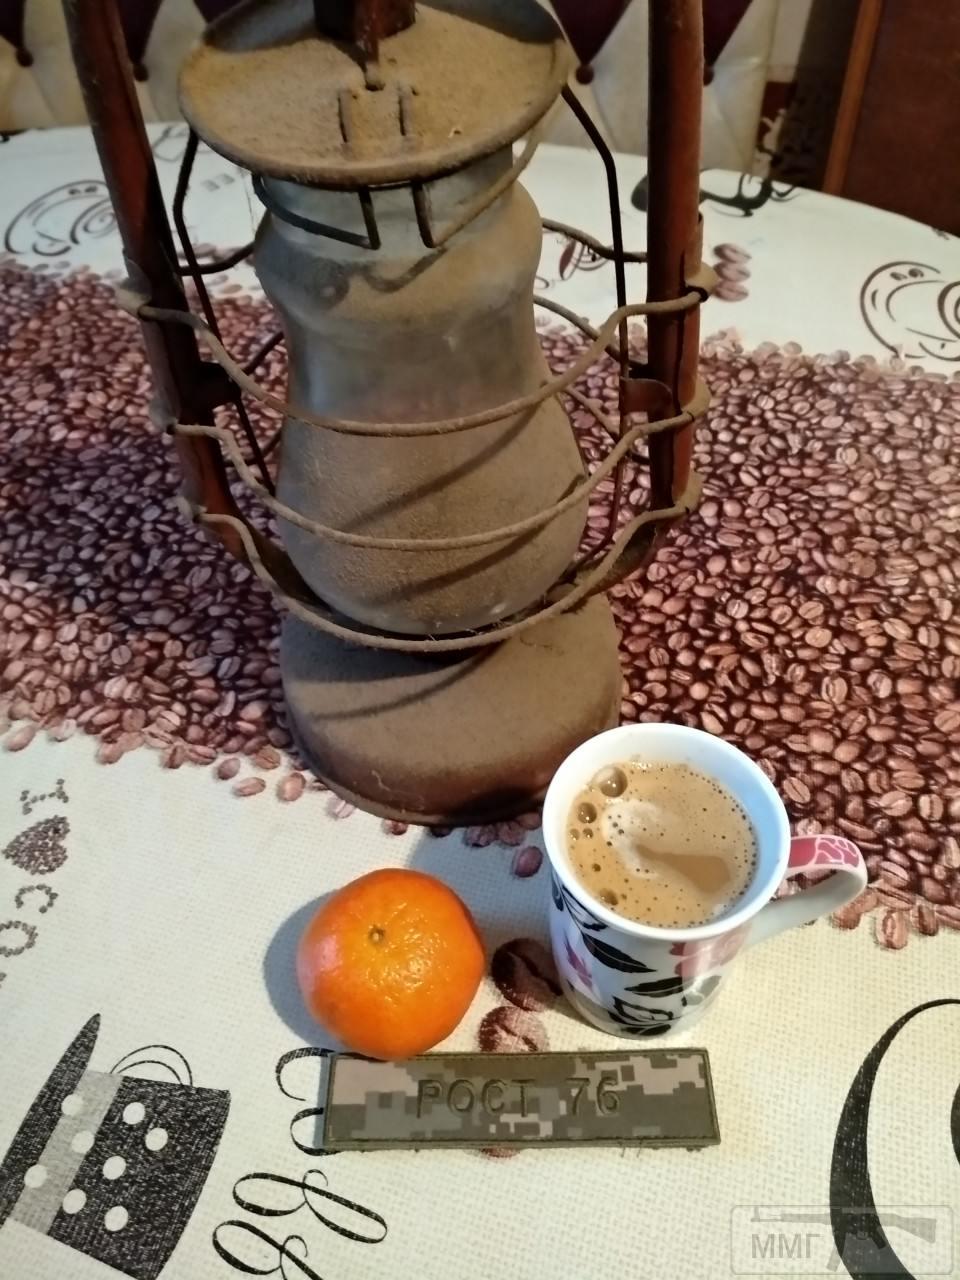 87685 - Копарські дні і будні.